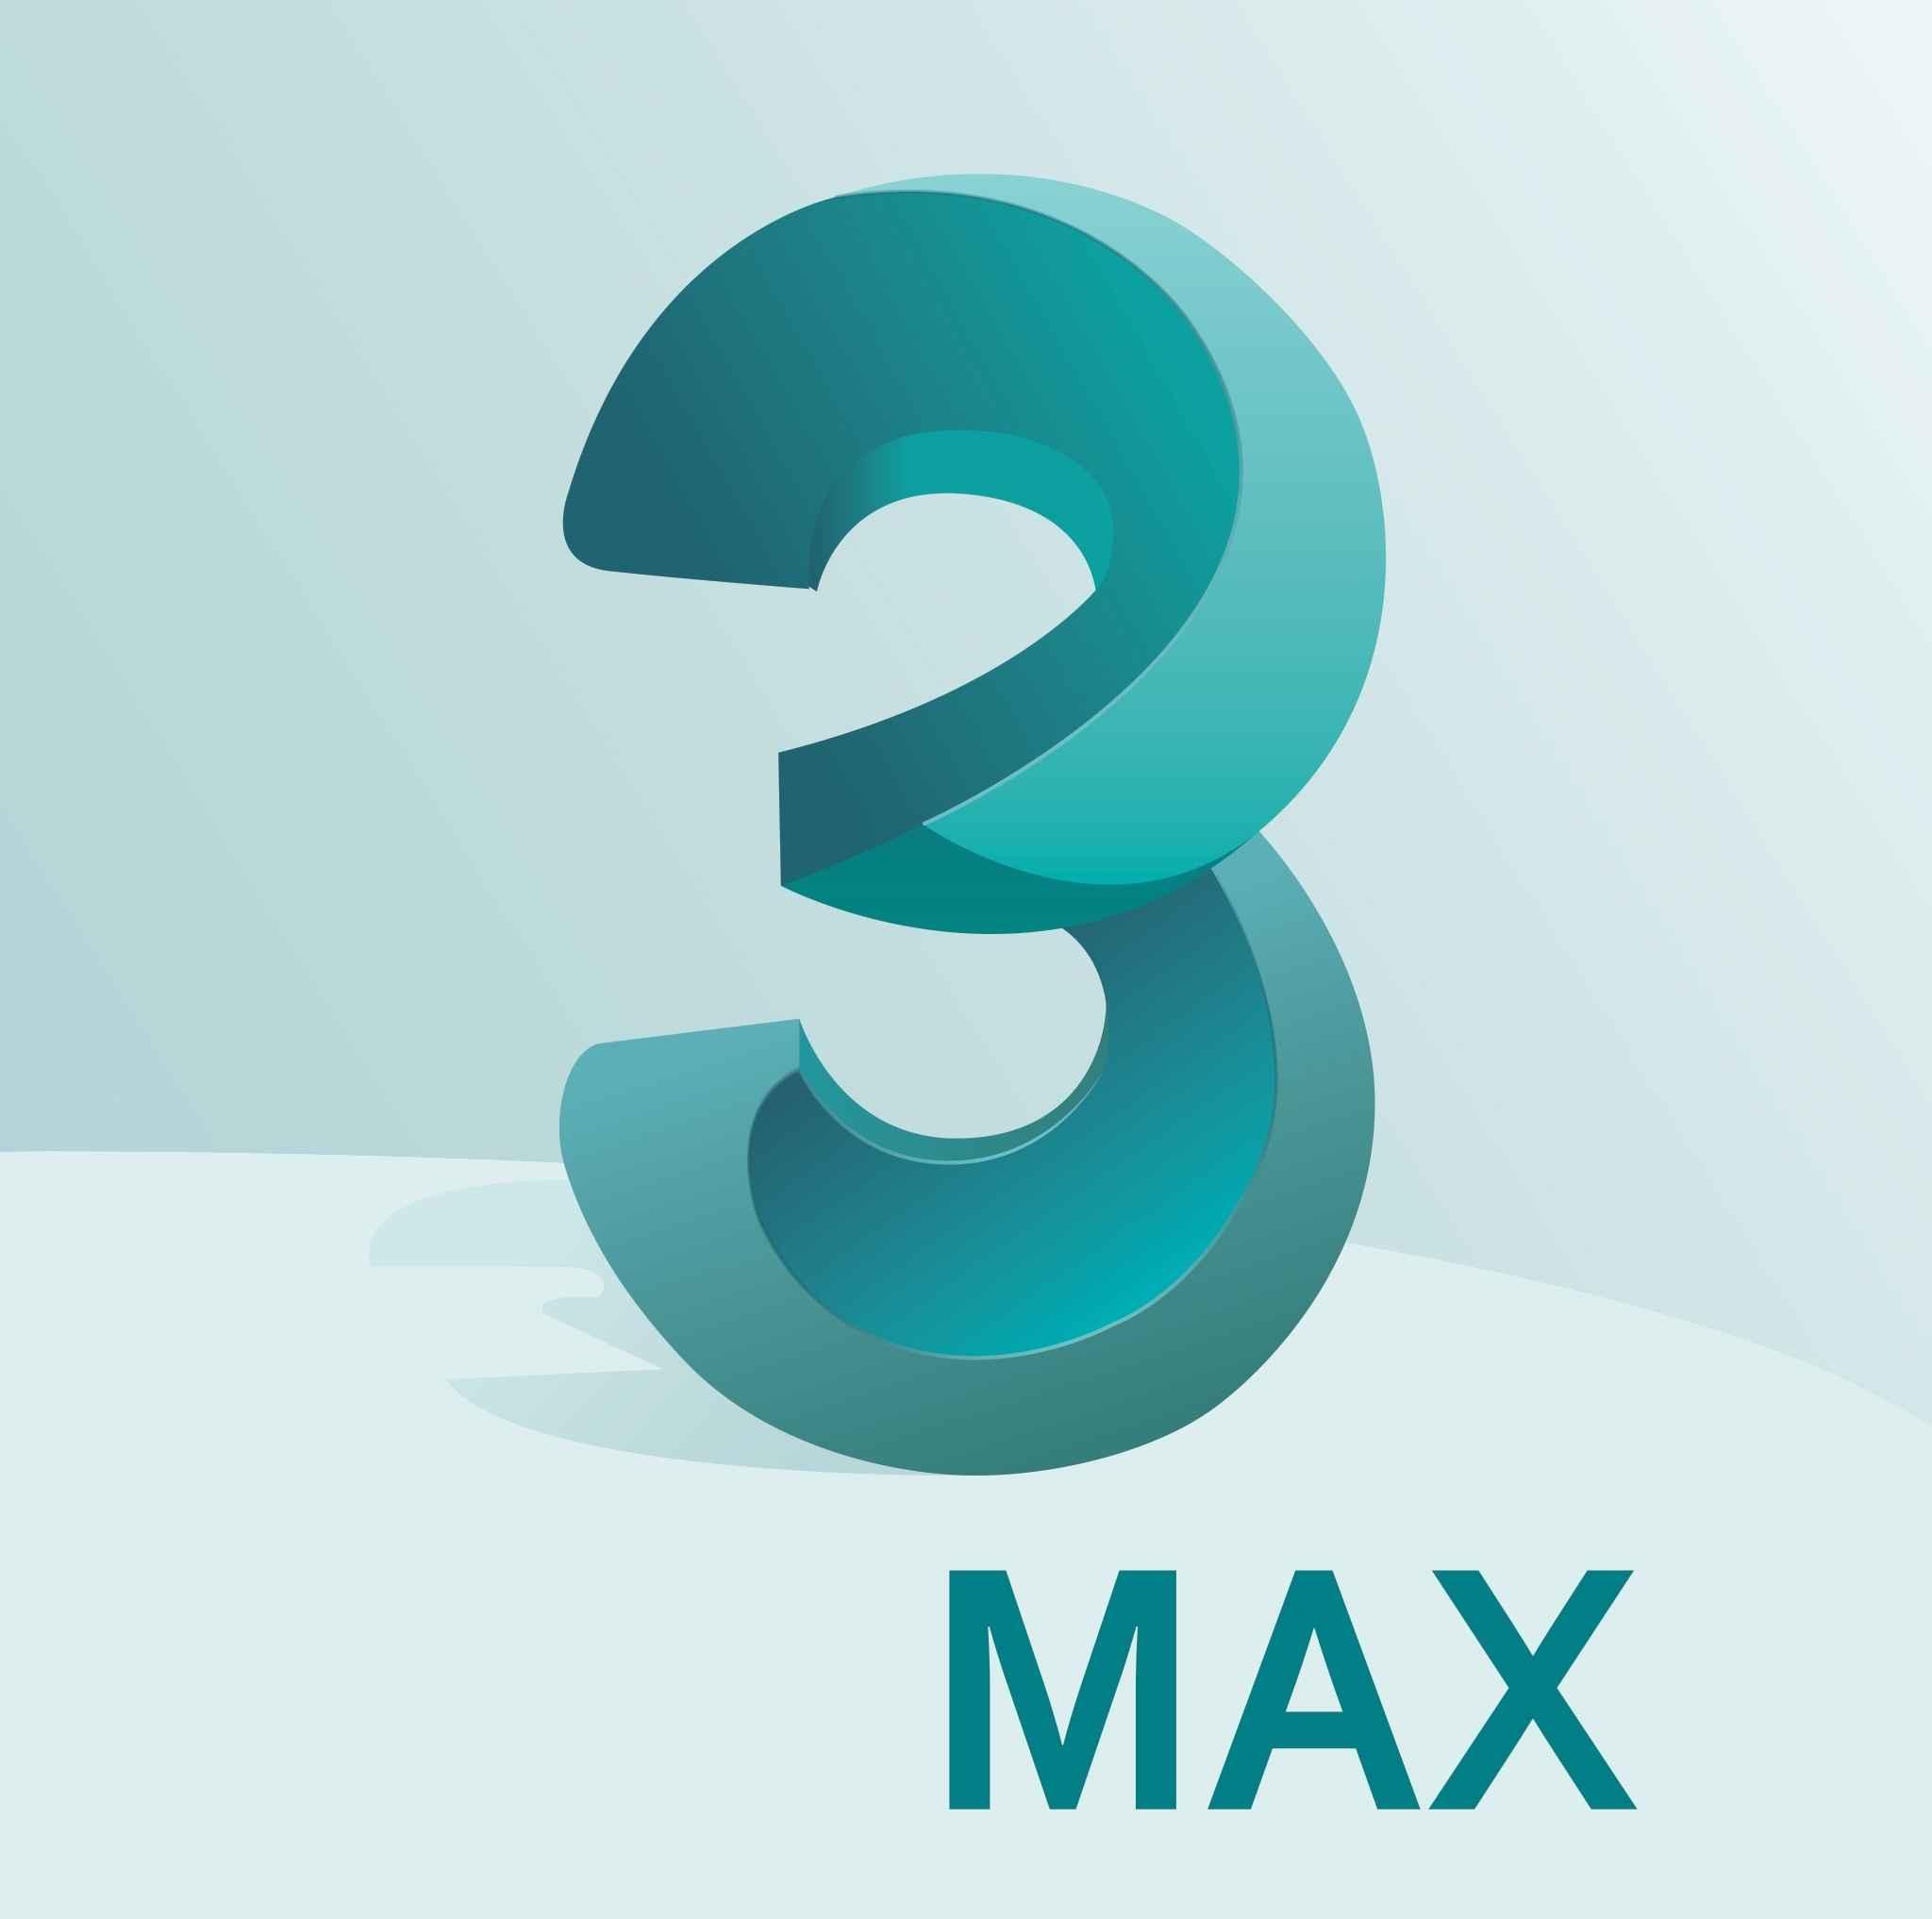 3dsmax logo